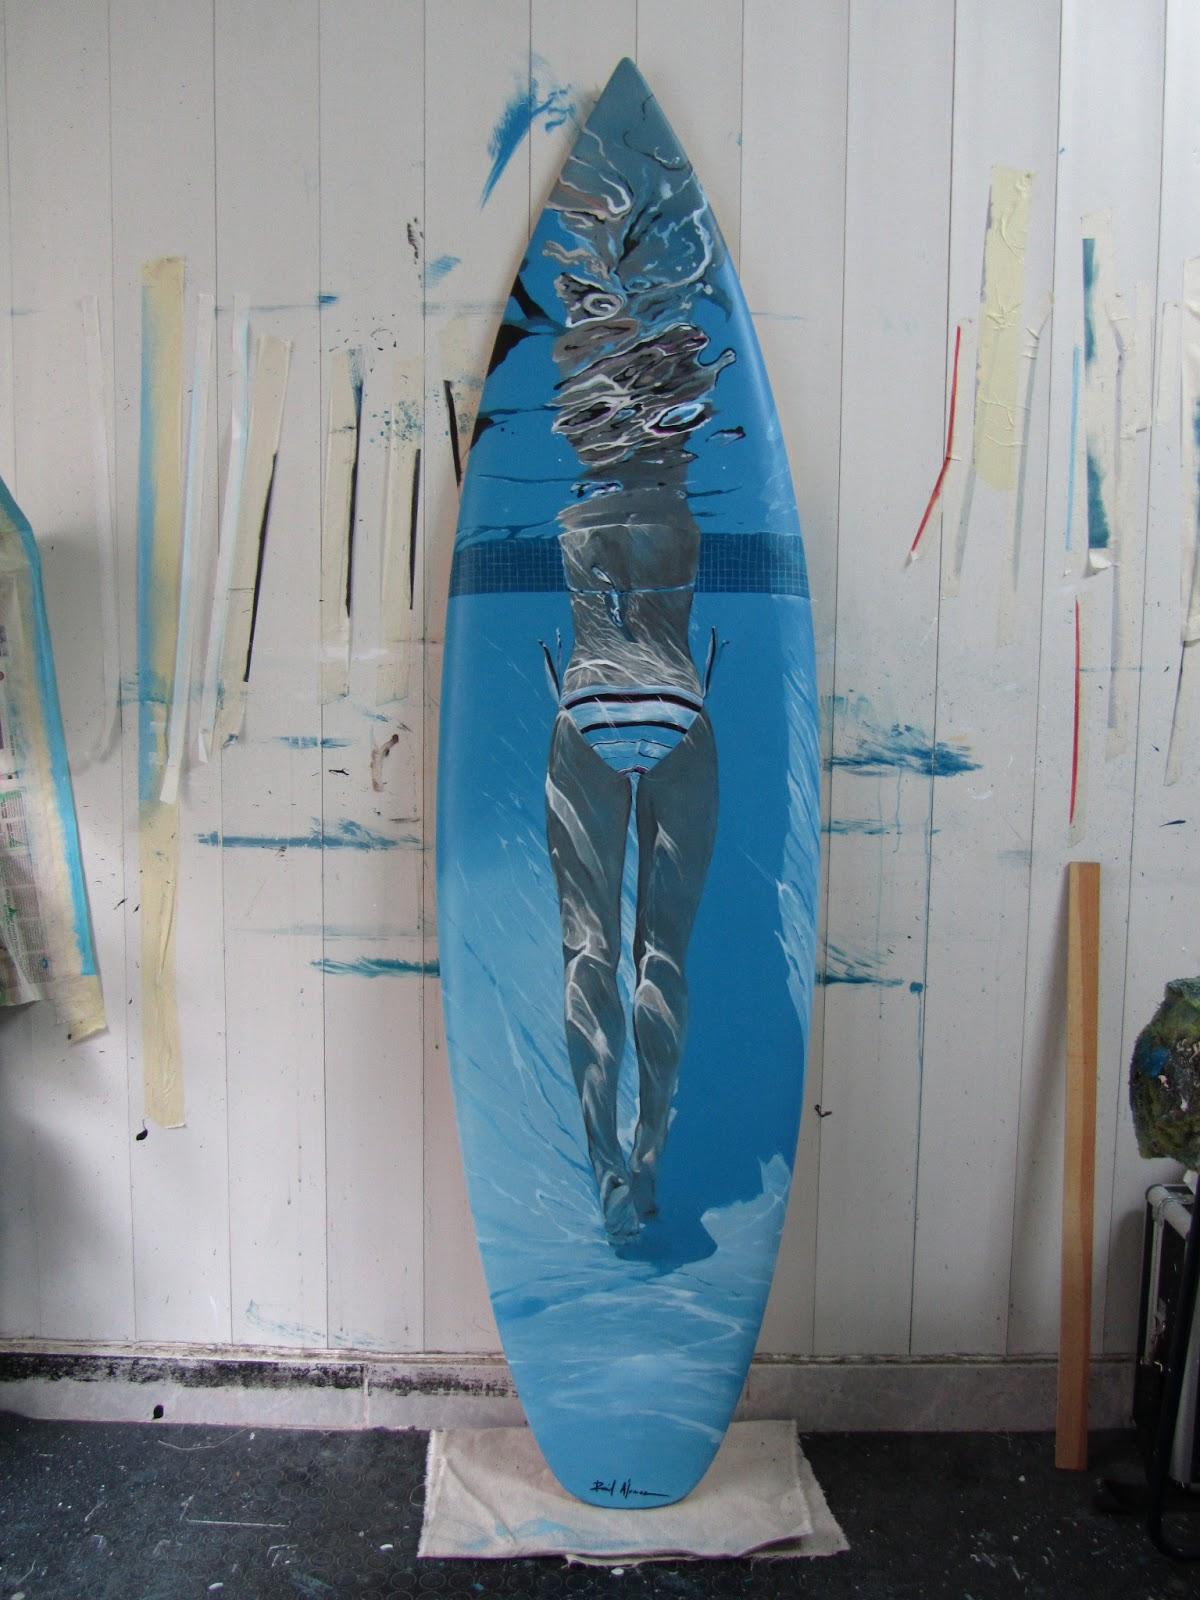 Surfer legs